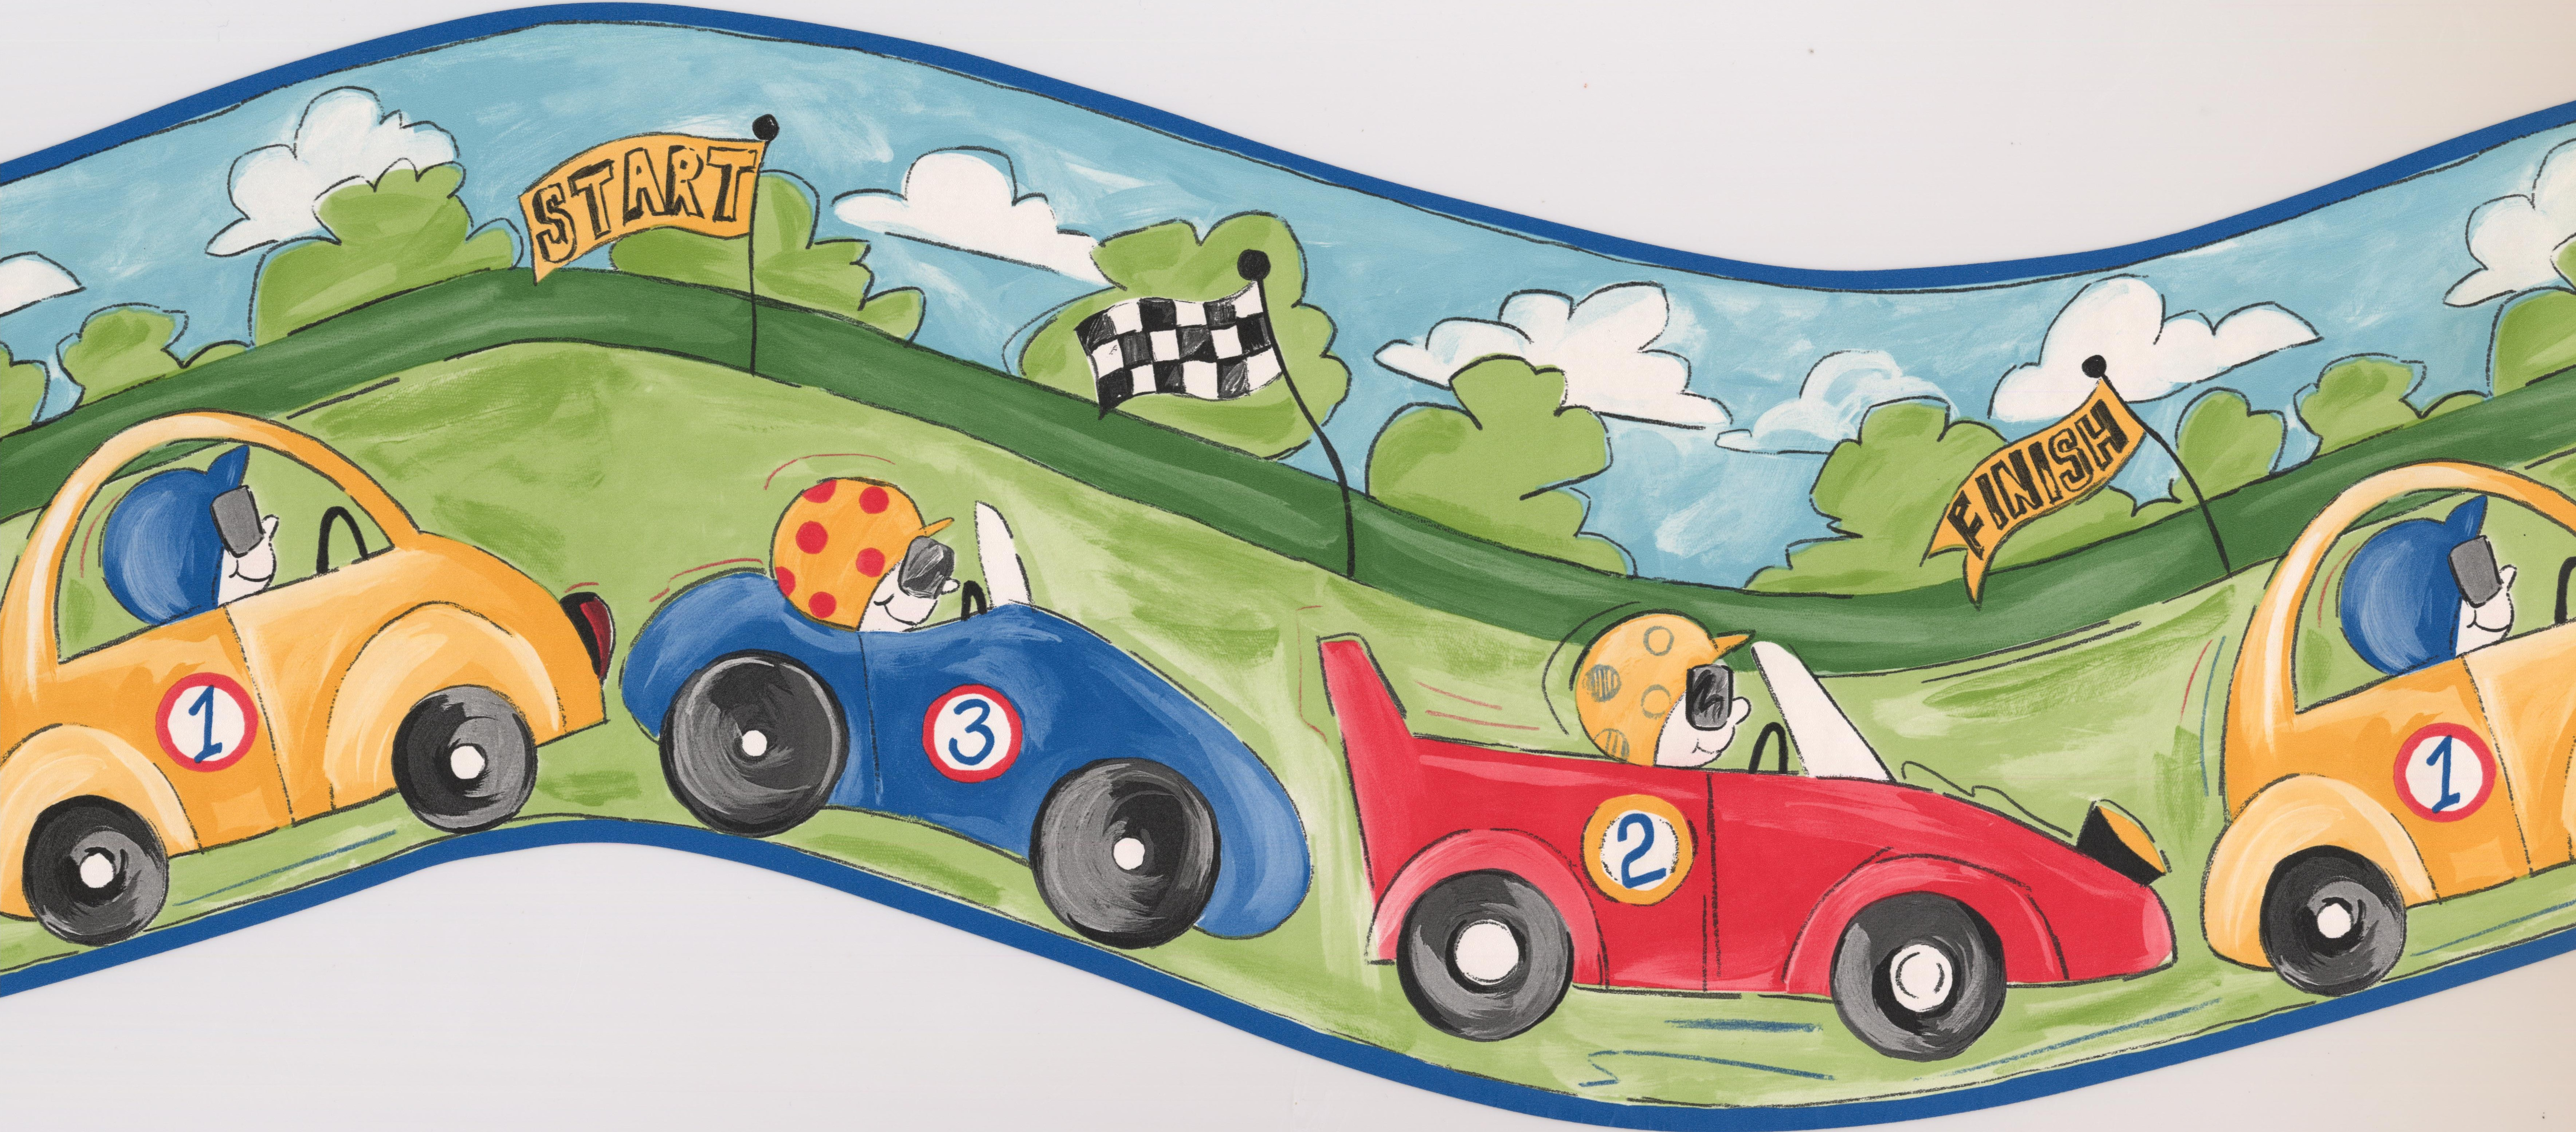 Retro Art Race Cars Wallpaper Border 15 X 10 Lowe S Canada